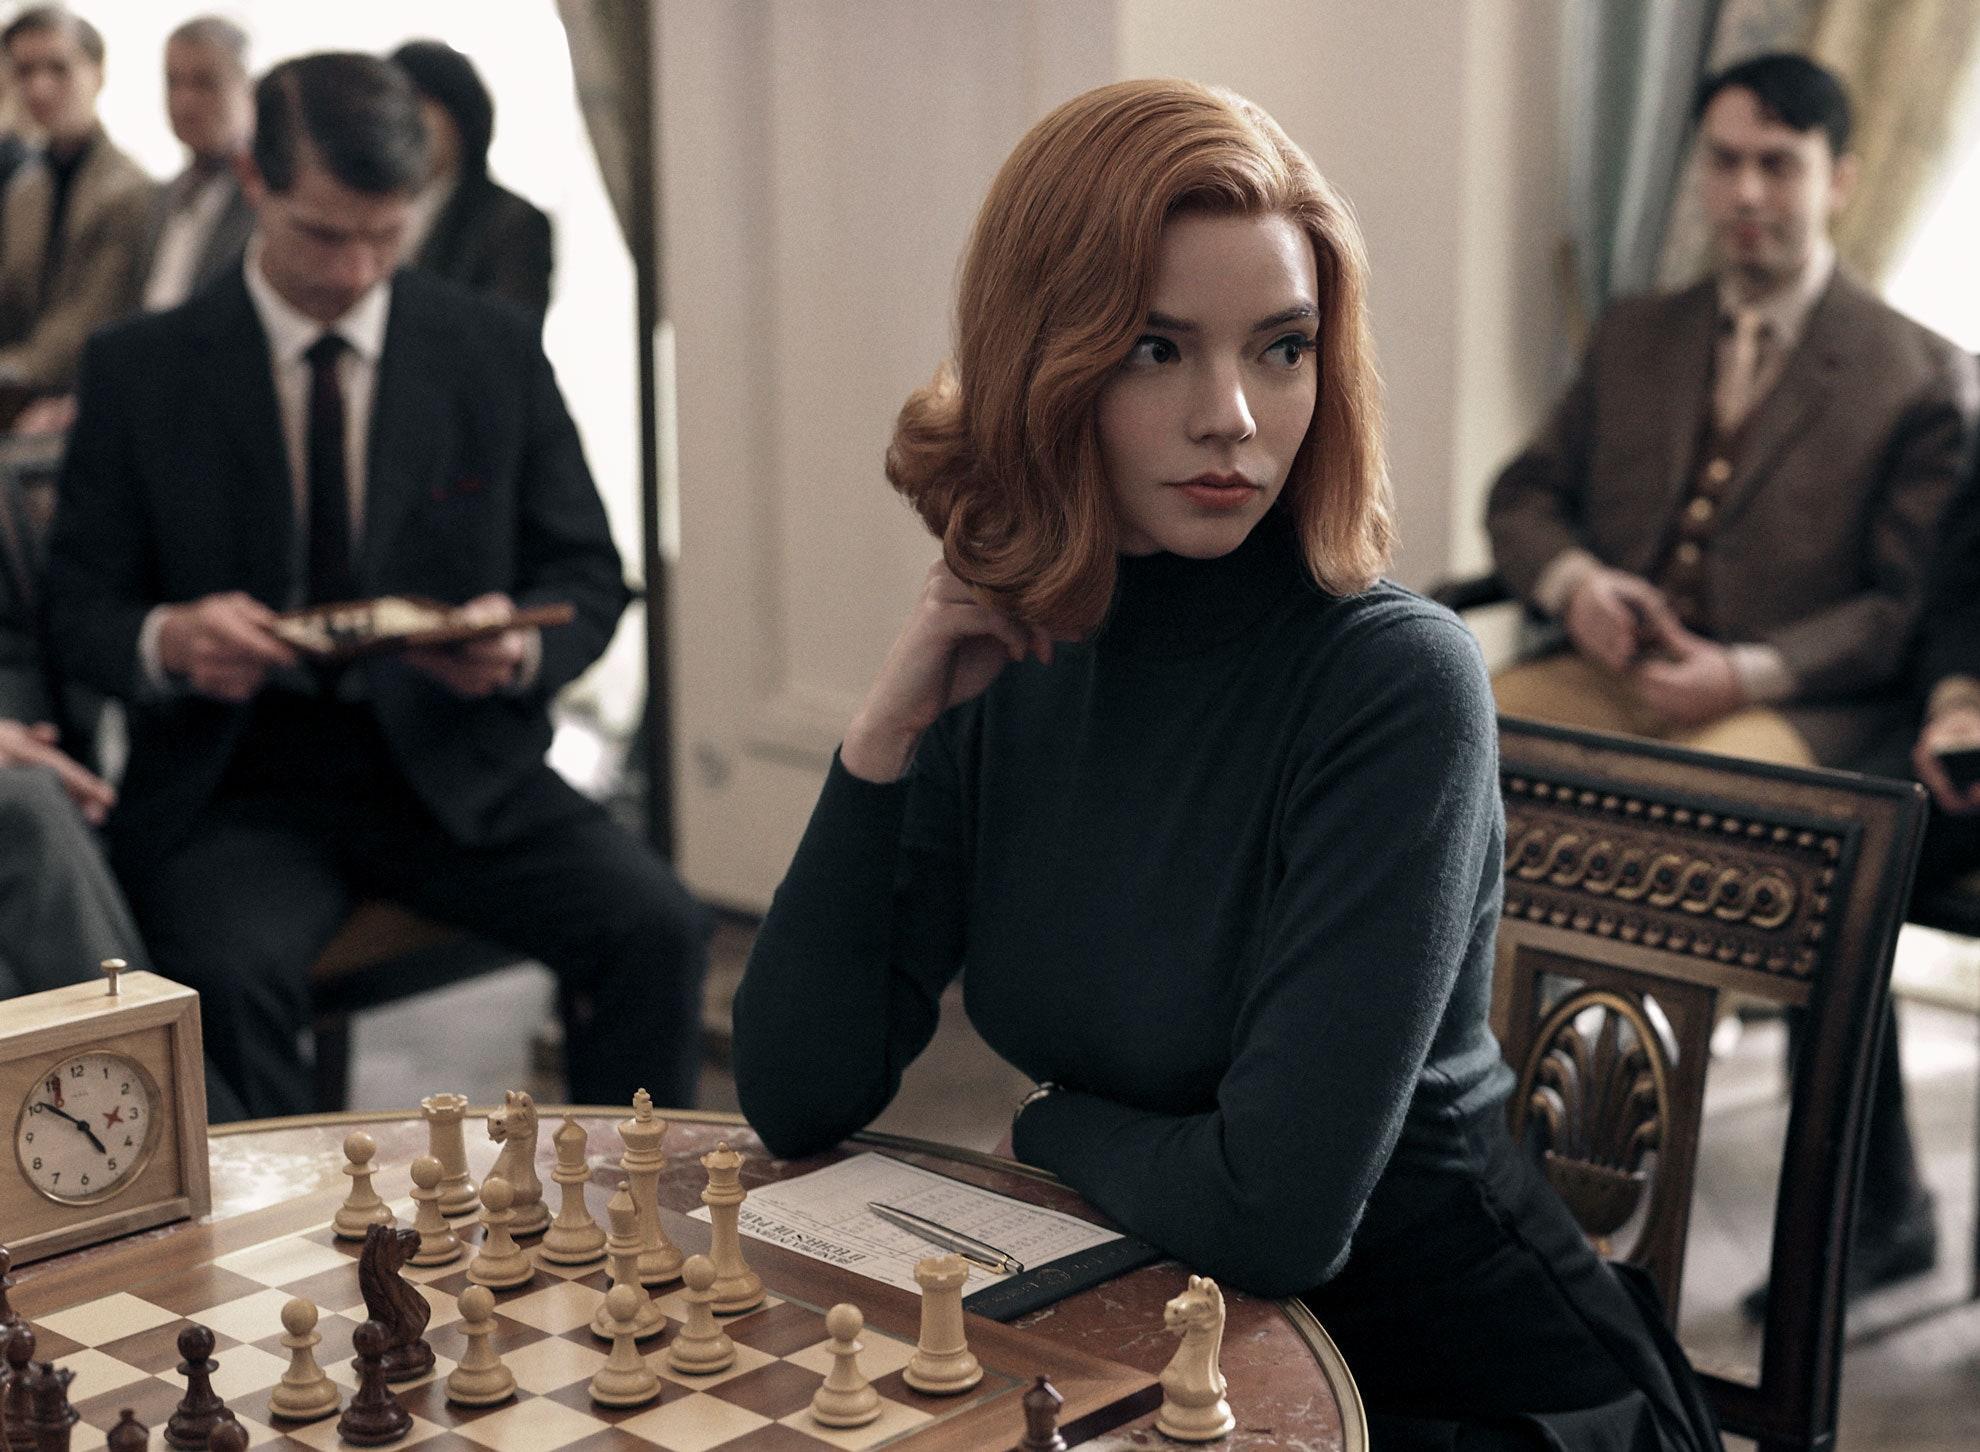 'The Queen's Gambit': Anya Taylor-Joy Talks Season 2 After Golden Globes Win